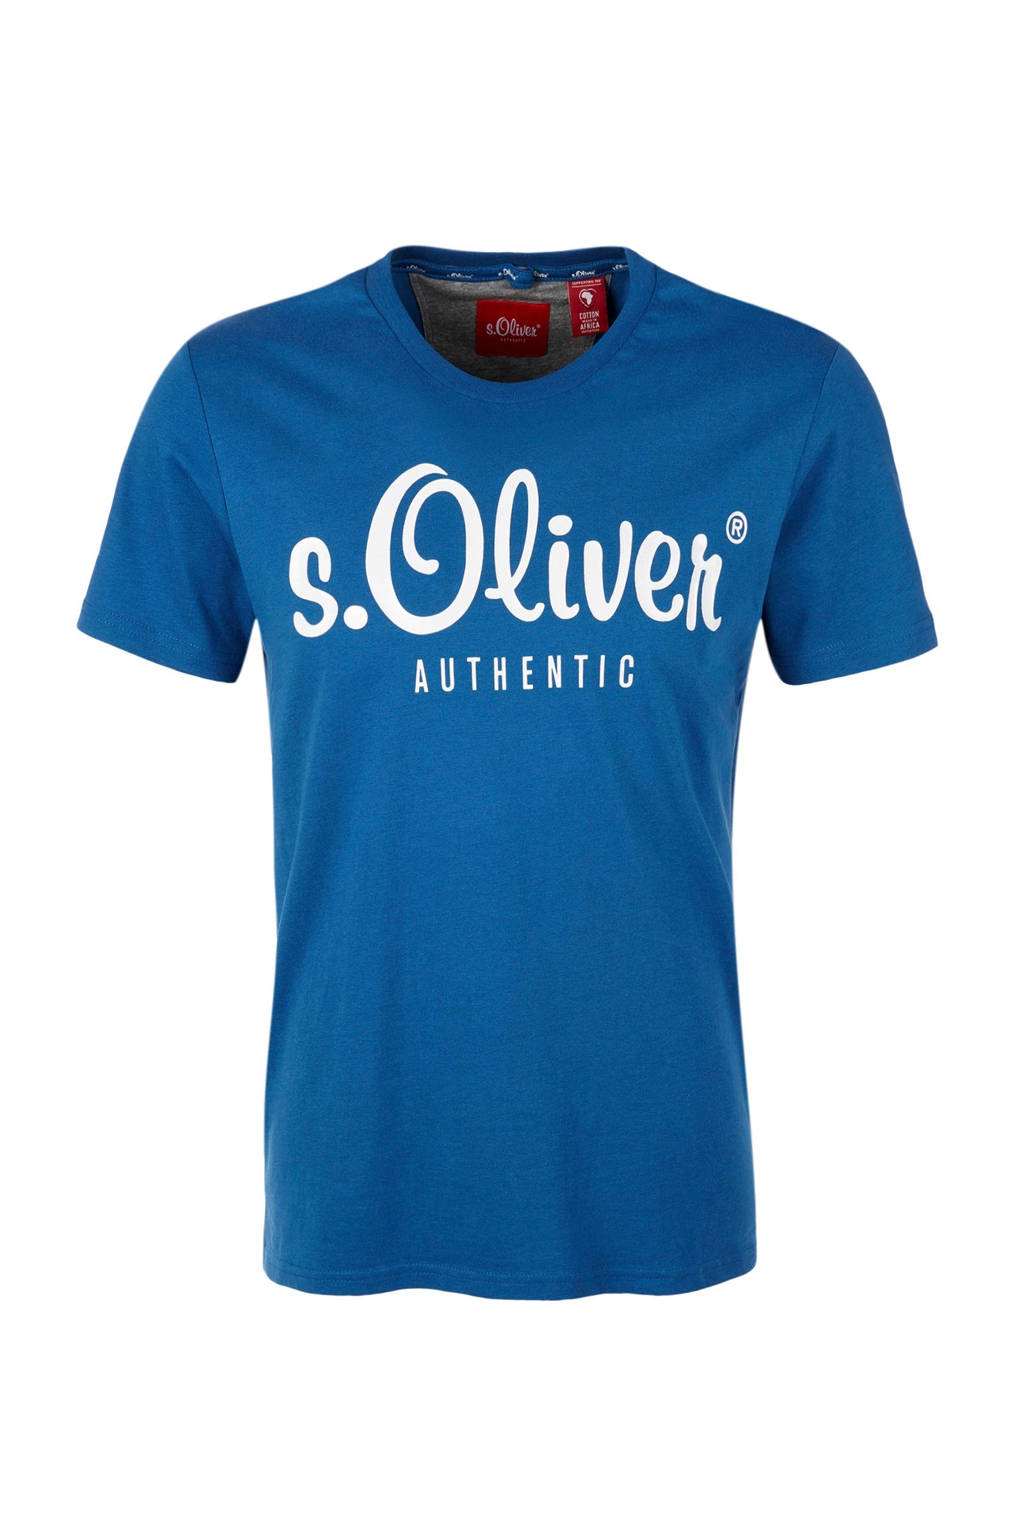 s.Oliver T-shirt, Blauw